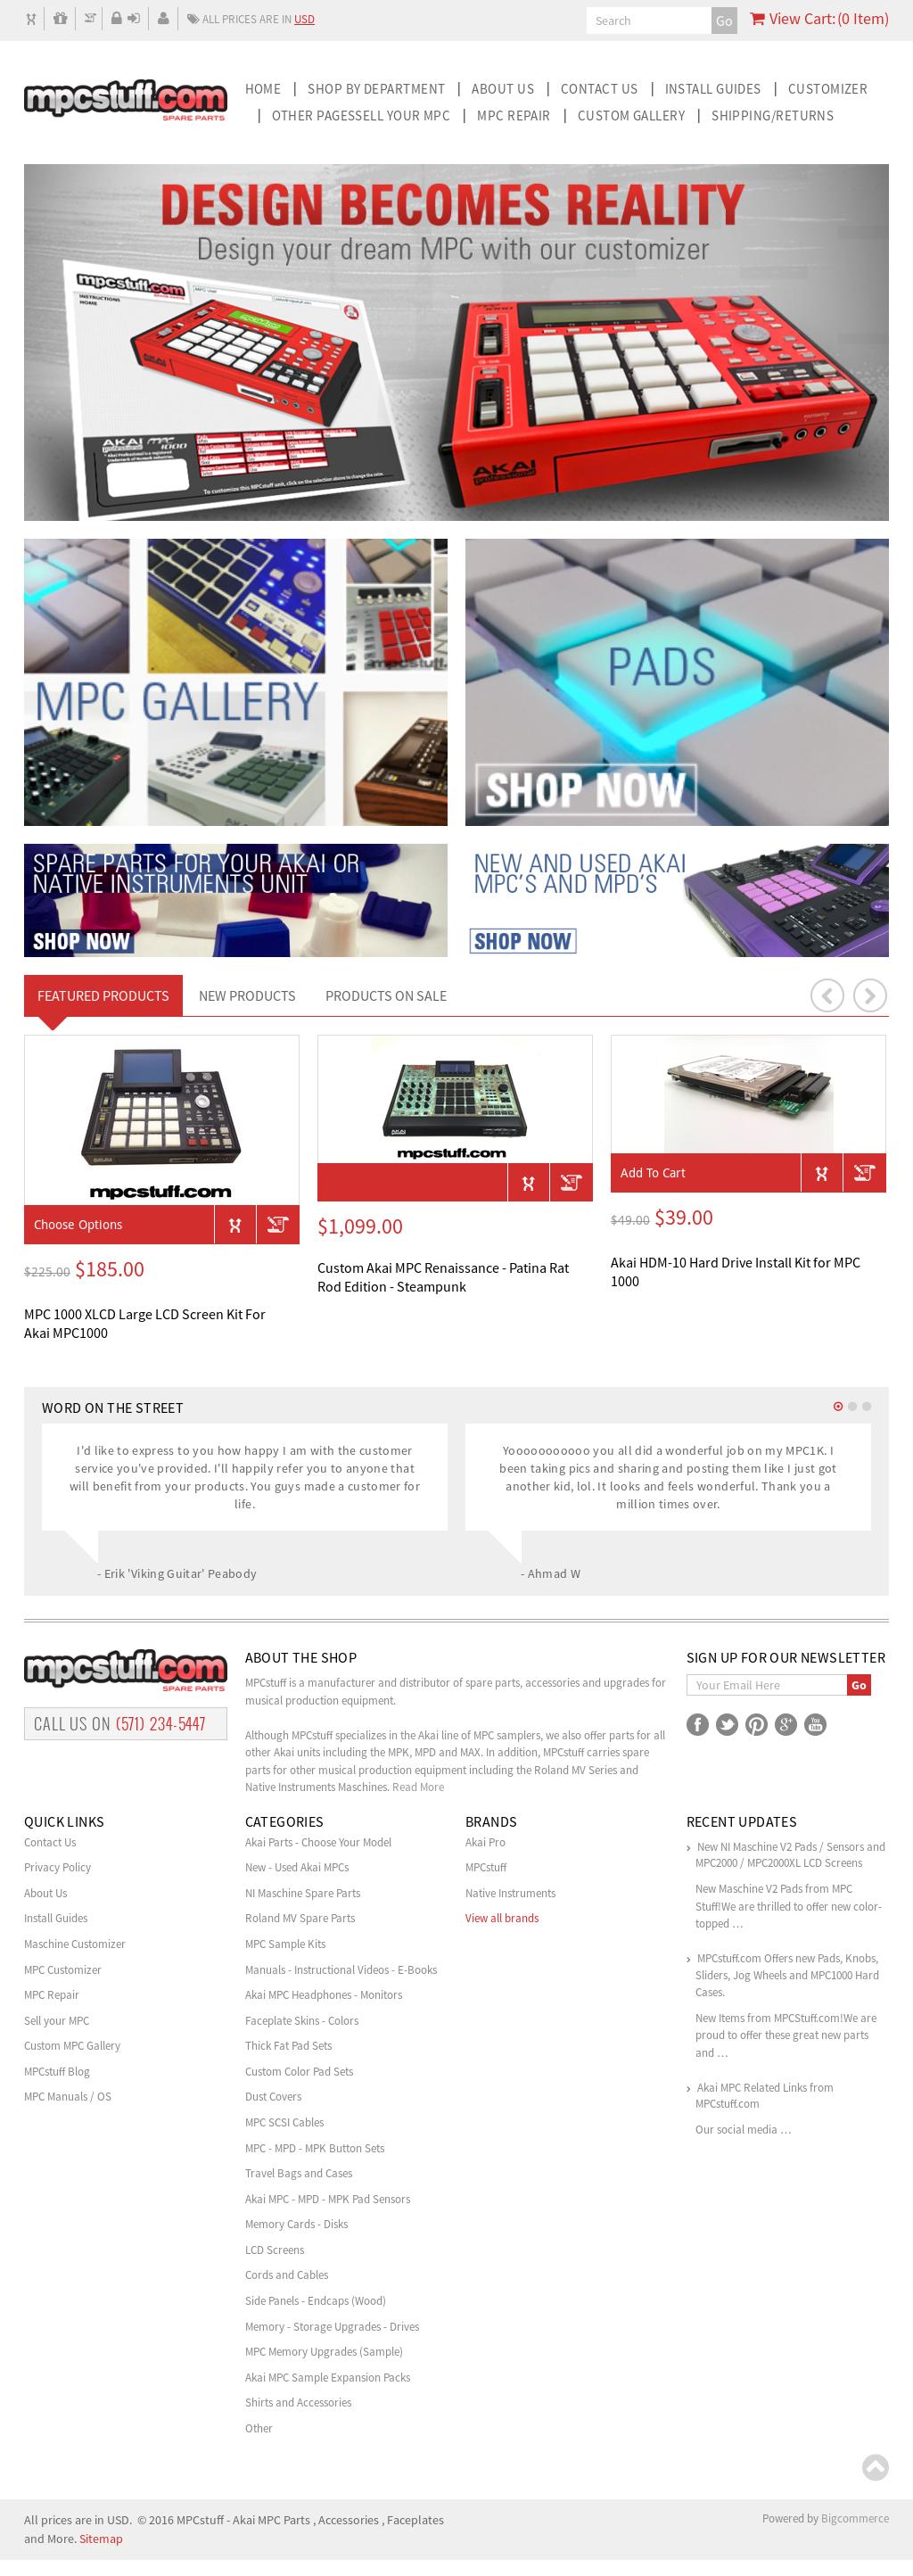 Mpcstuff Competitors, Revenue and Employees - Owler Company